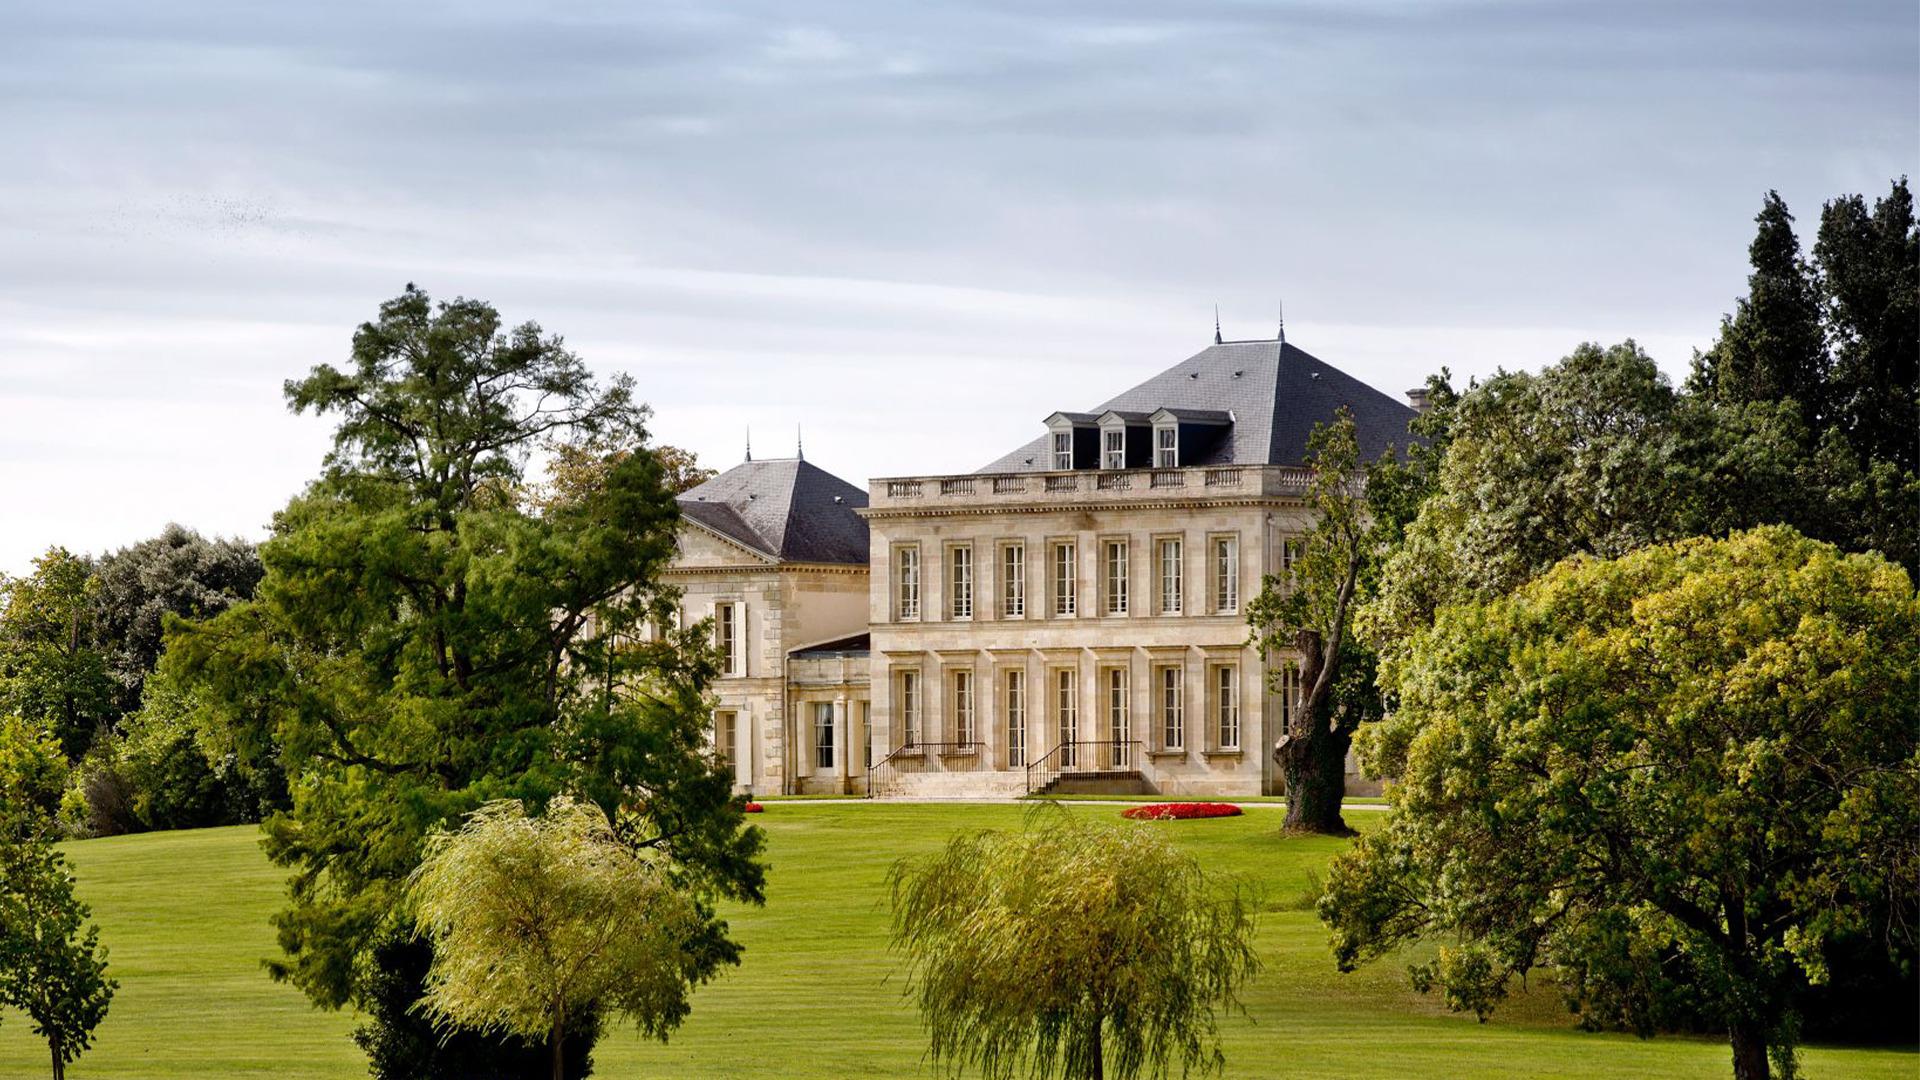 Rượu Vang Chateau Phelan Segur